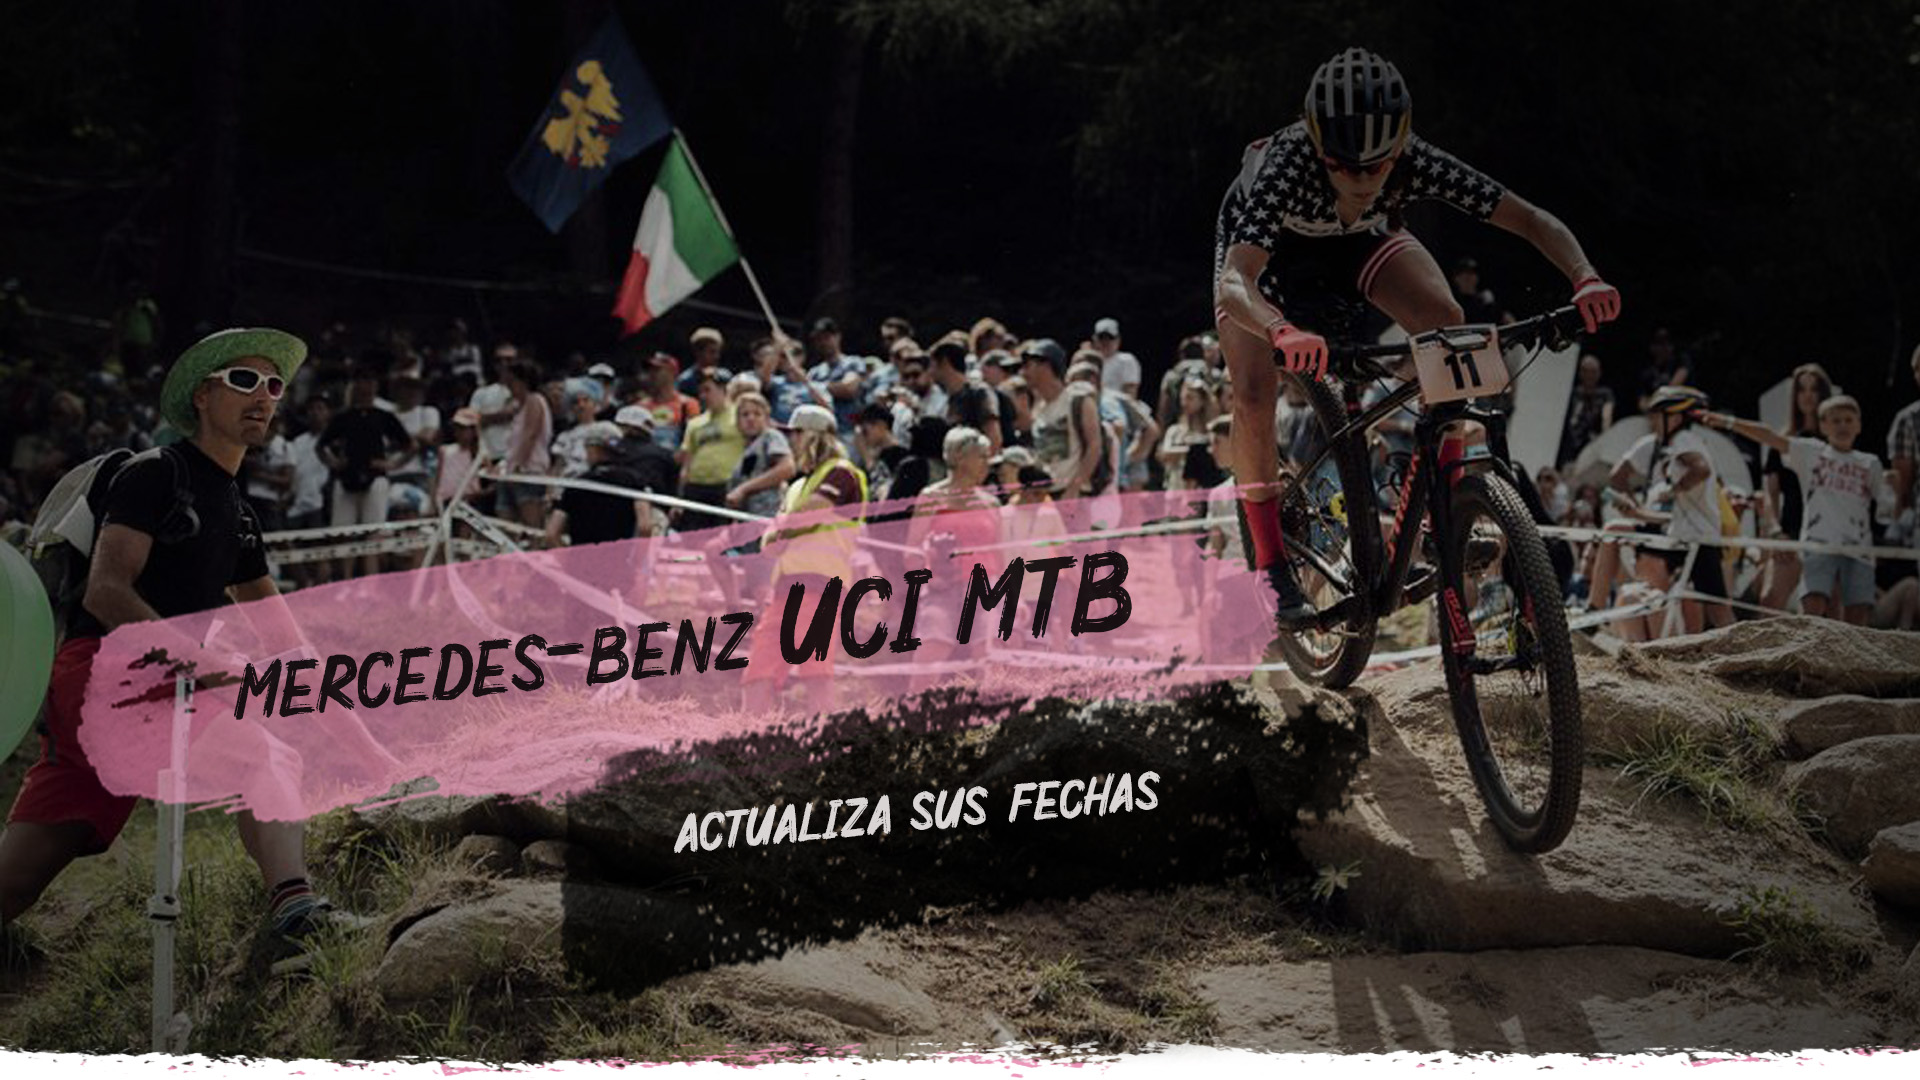 Mercedes-Benz UCI MTB World Cup 2021 de Descenso y Cross-Country.